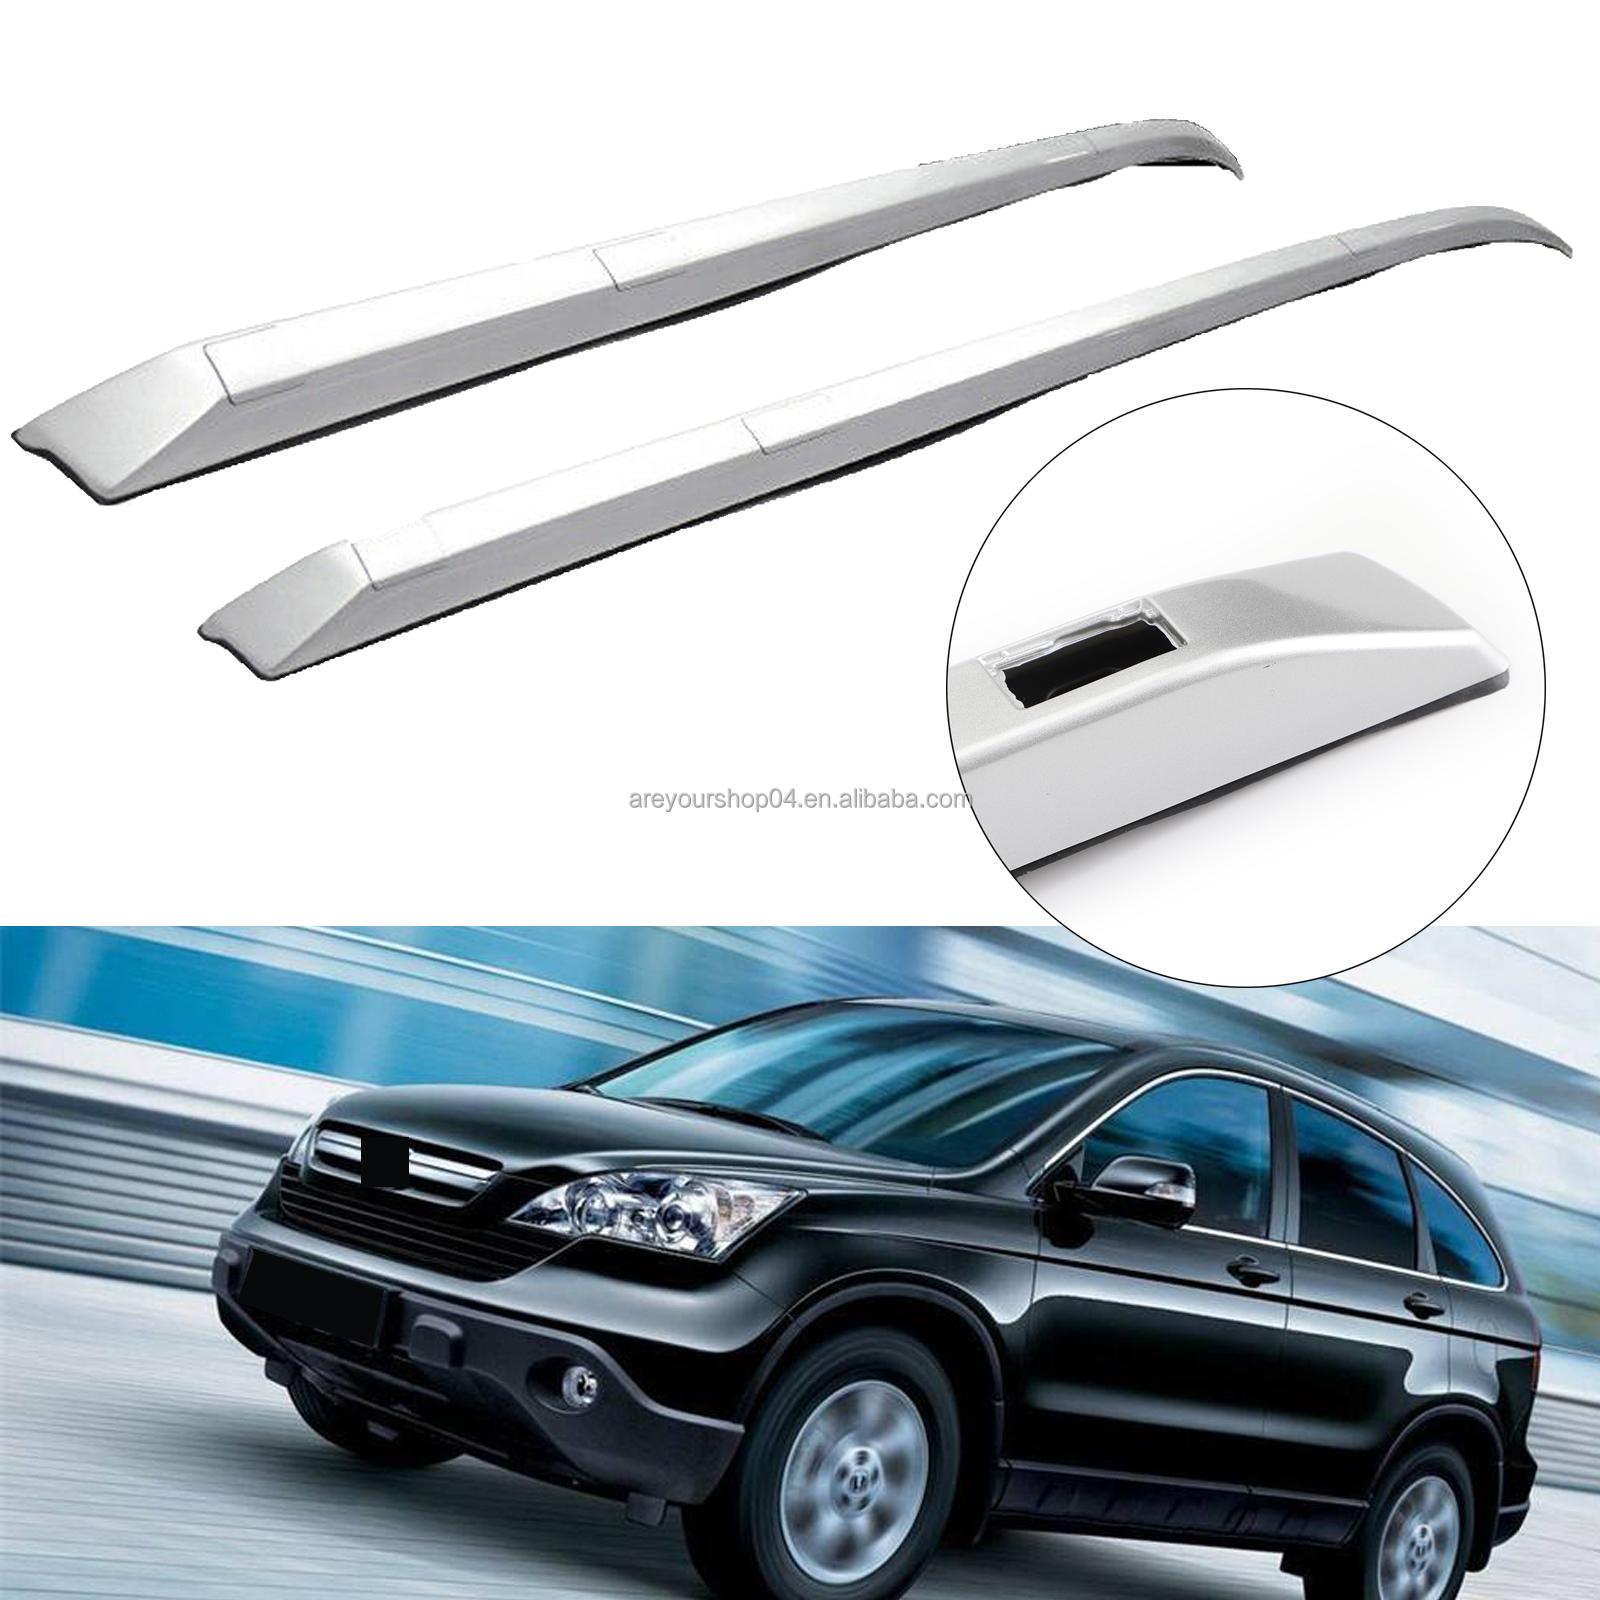 areyourshop pair roof rack rail bar silver factory style cr v fits for honda crv 2012 2013 2014 2015 2016 buy for honda cr v 2012 13 14 15 2016 top